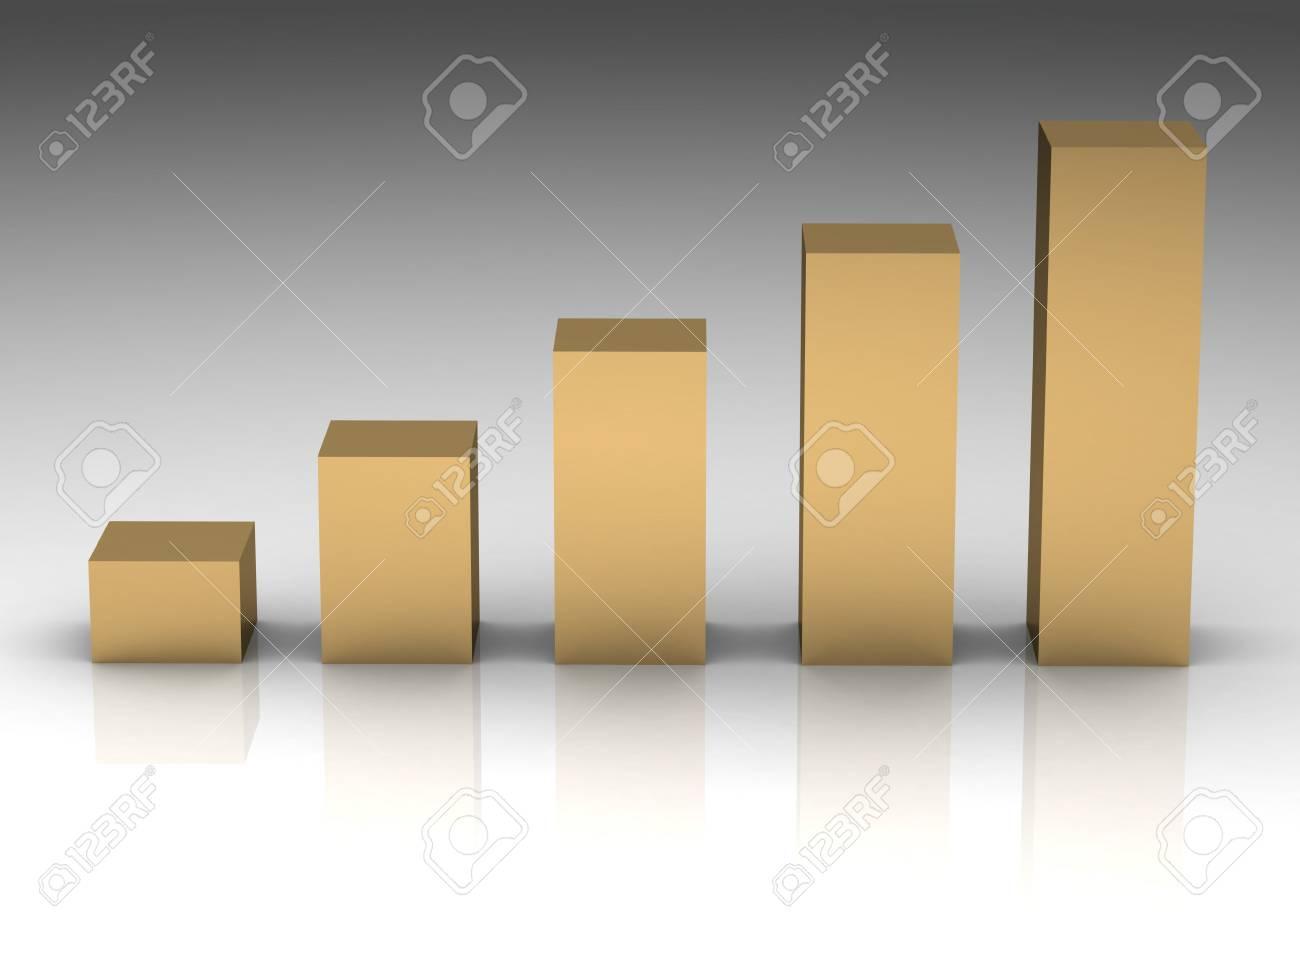 Increasing Gold Bars As Symbol For Wealth Or Treasure Stock Photo